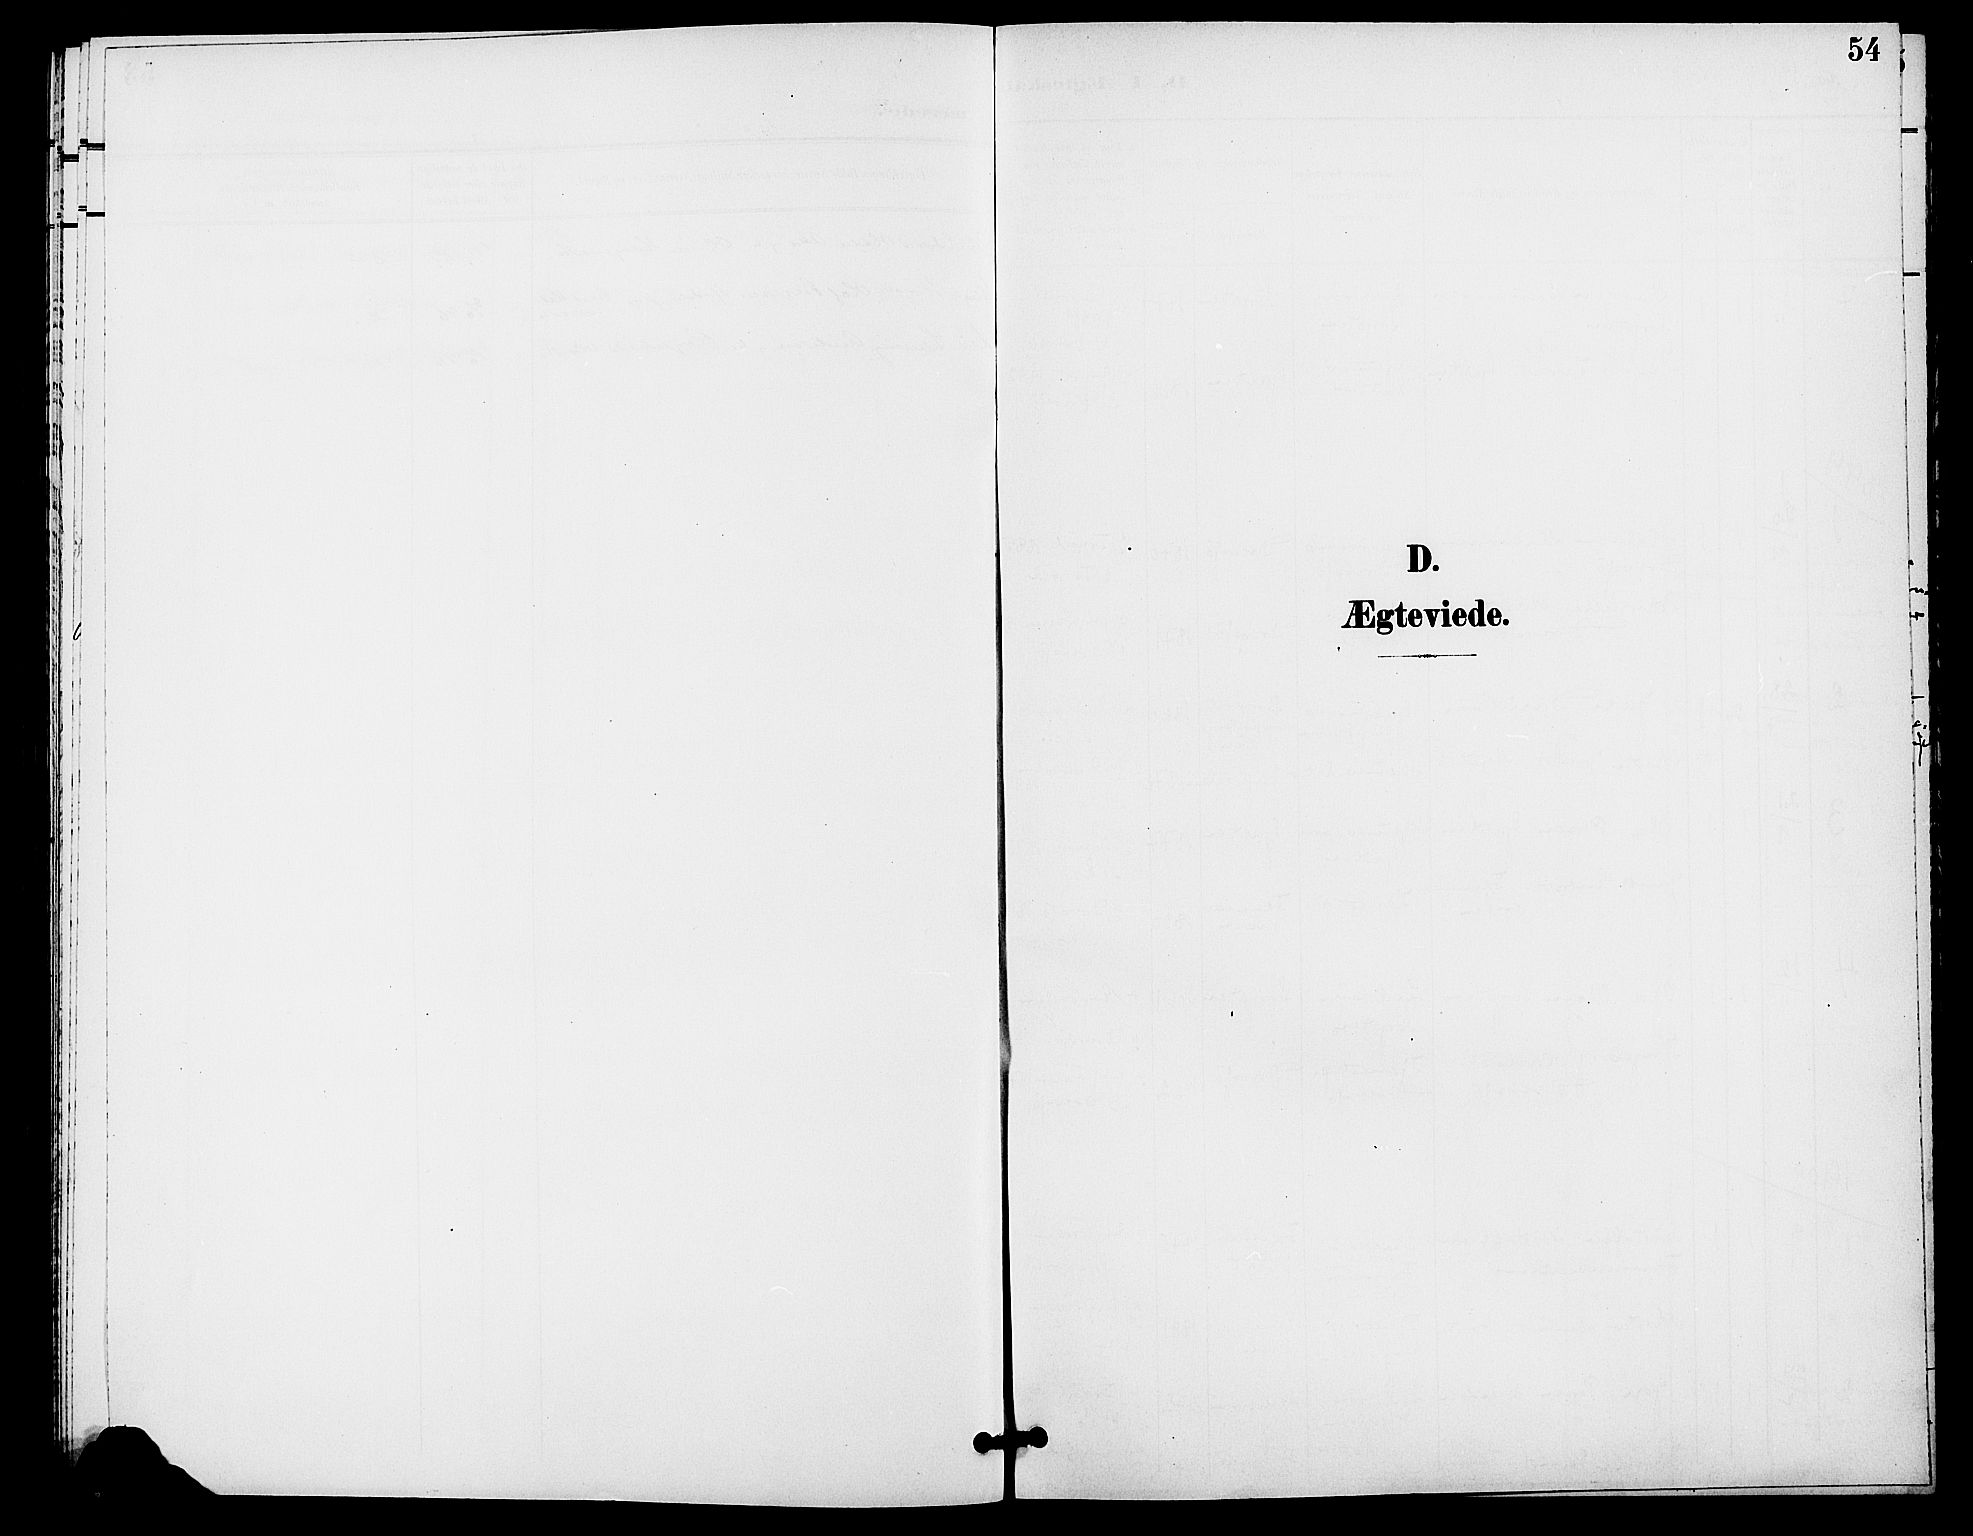 SAH, Rendalen prestekontor, H/Ha/Haa/L0008: Ministerialbok nr. 8, 1898-1910, s. 54